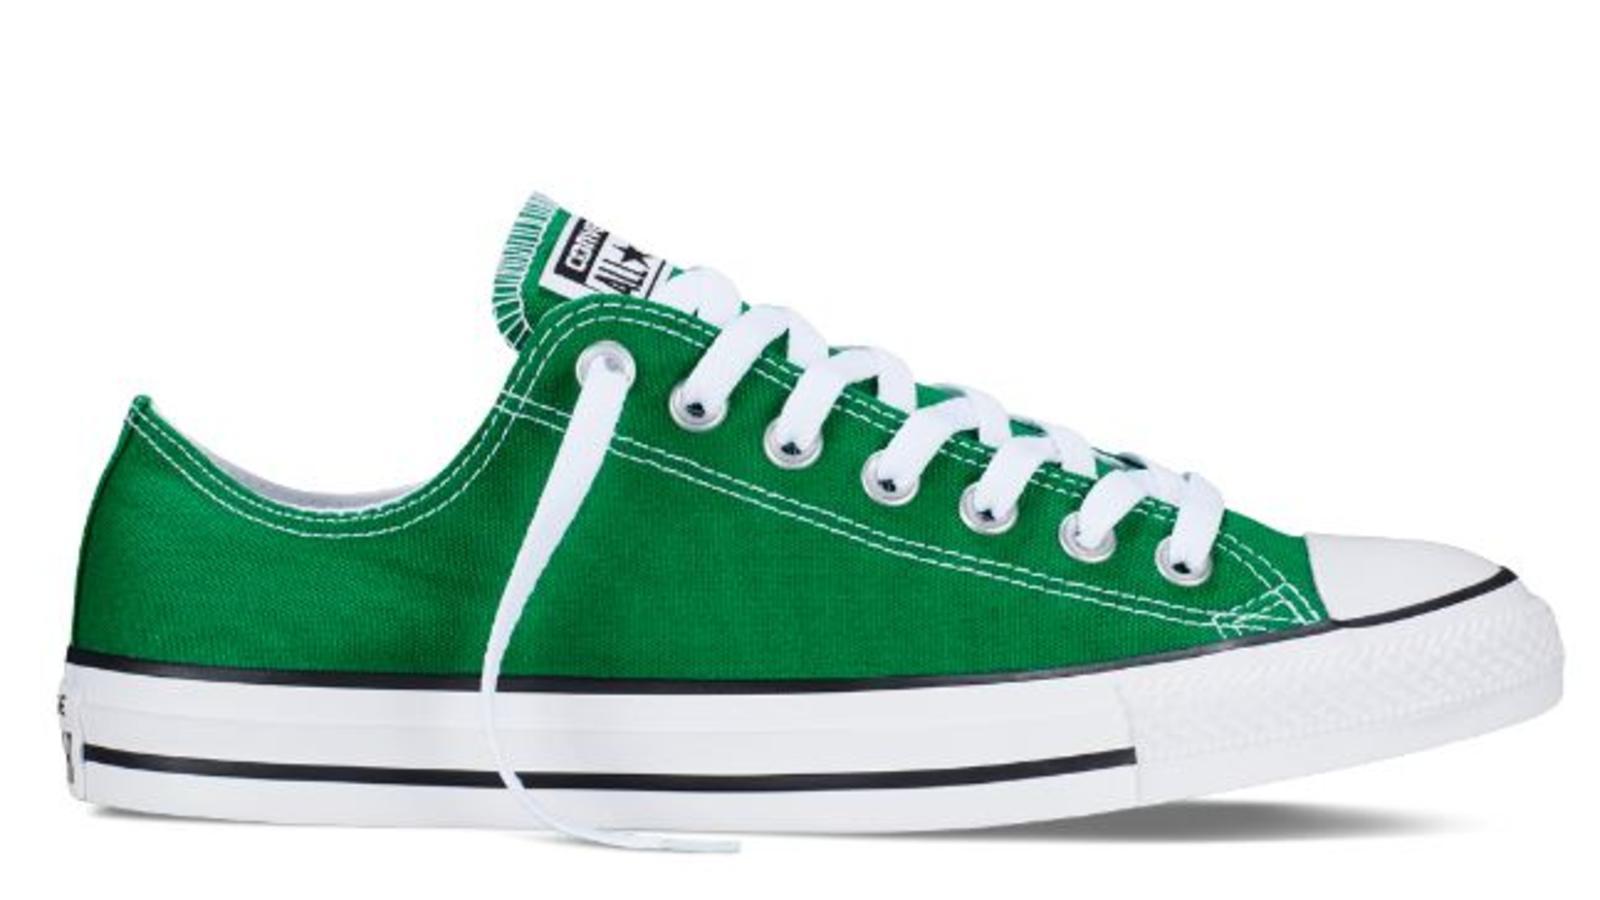 converse chuck taylor all star fresh colors - All Converse Colors